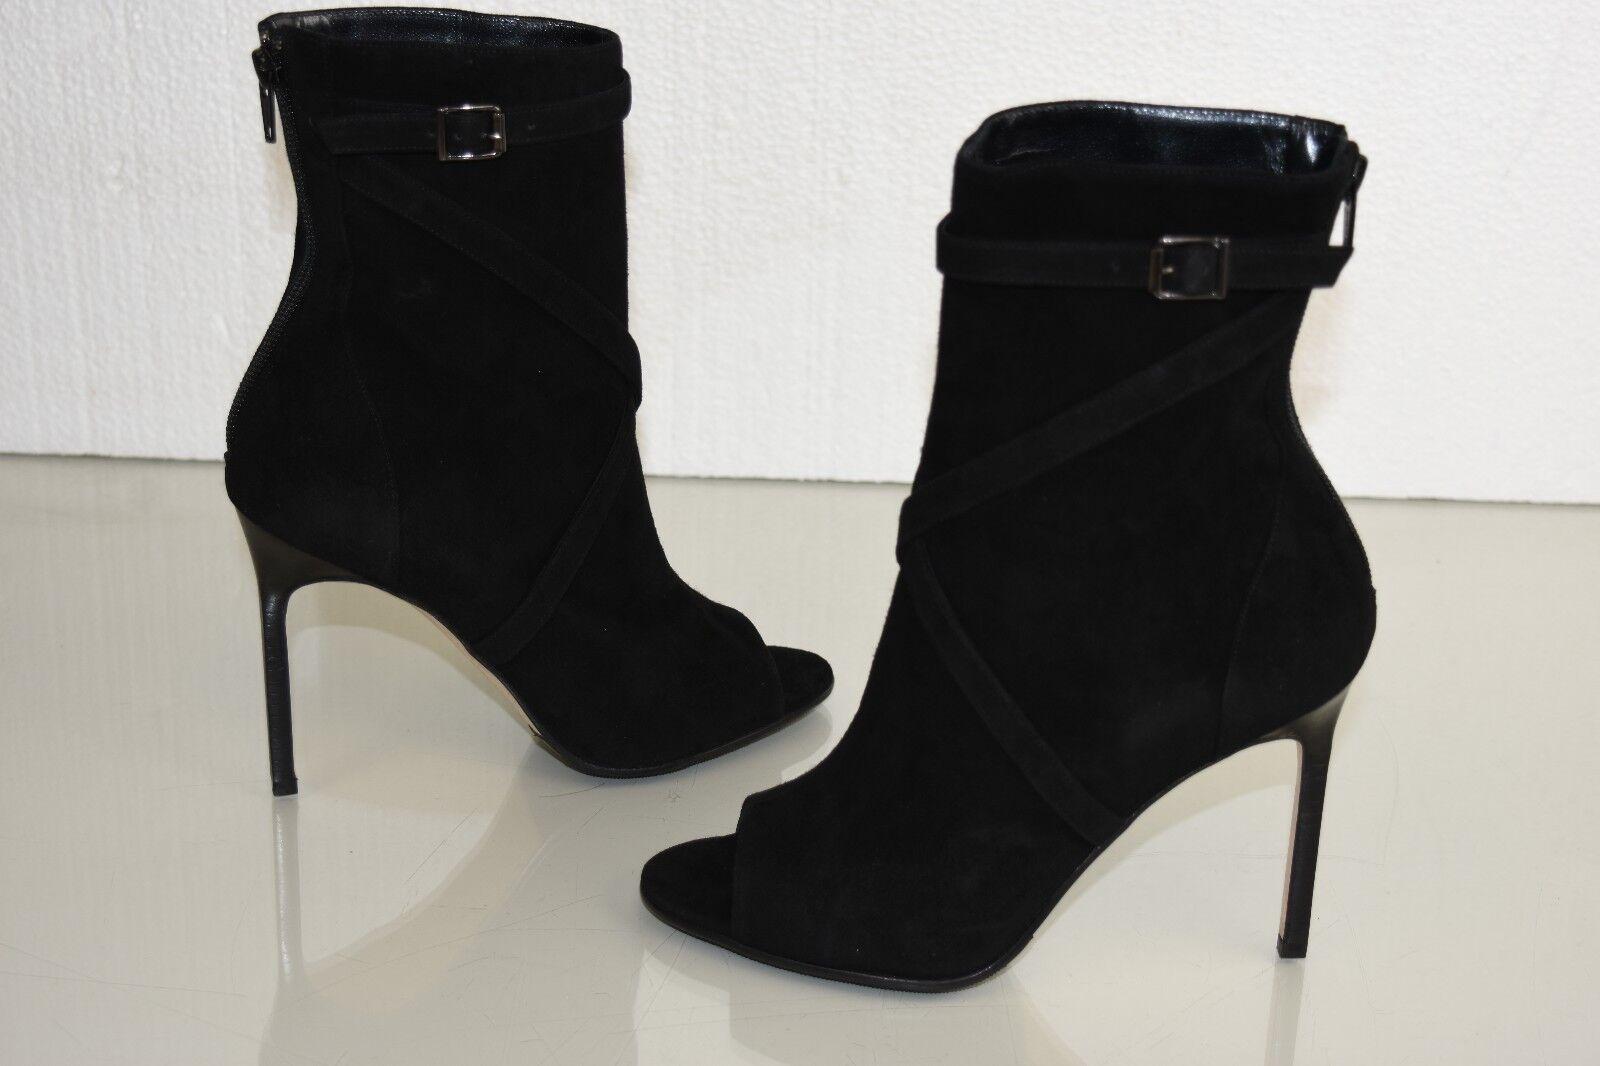 Nueva Manolo Blahnik M-Basella 105 botas Zapatos De Gamuza Botín Negro 37 40 41.5